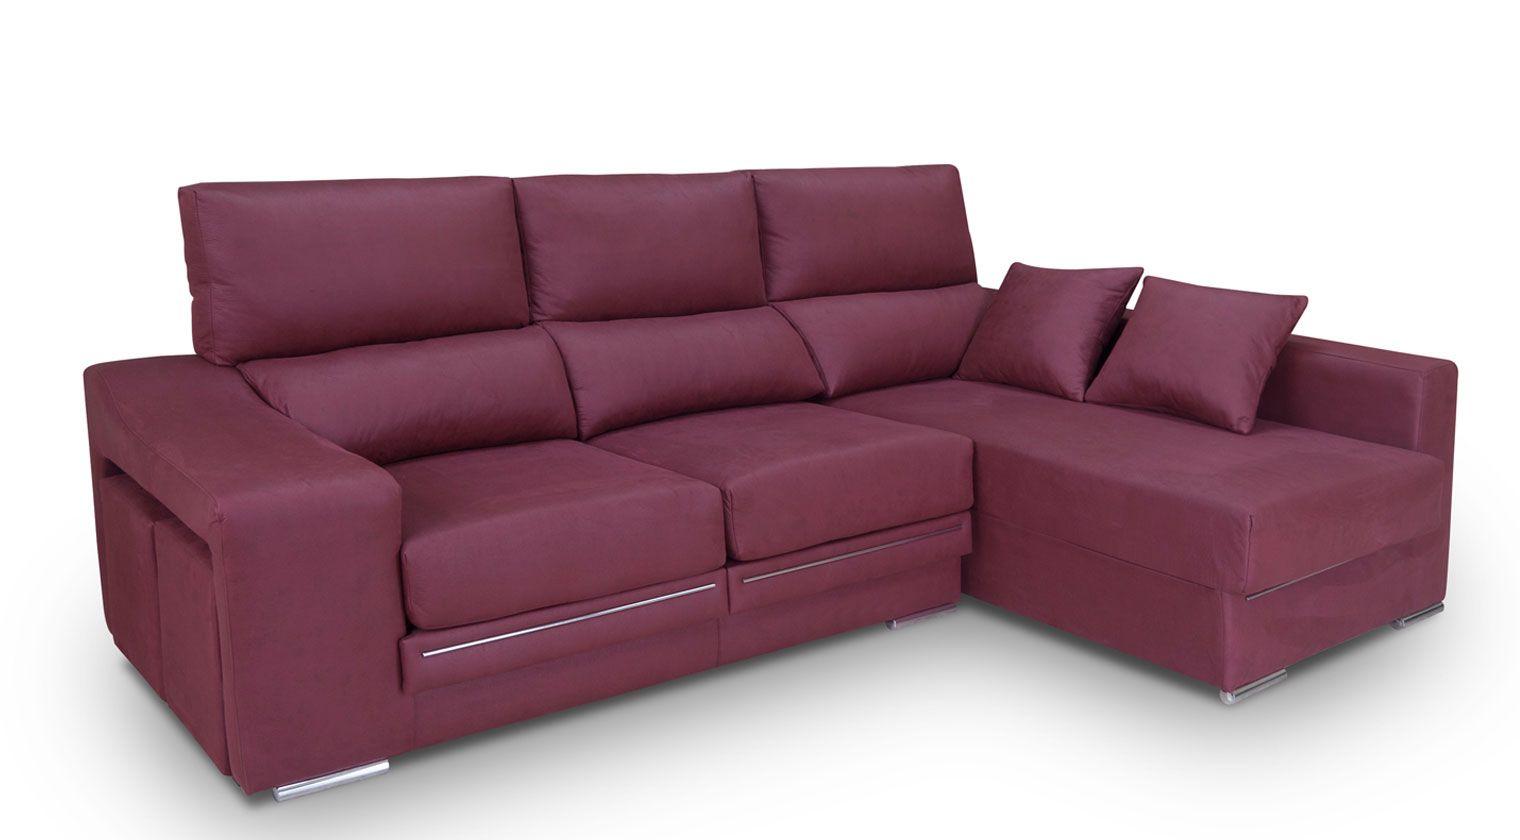 Comprar chaise longue tela hera mod 3 5 plazas for Comprar chaise longue barato online